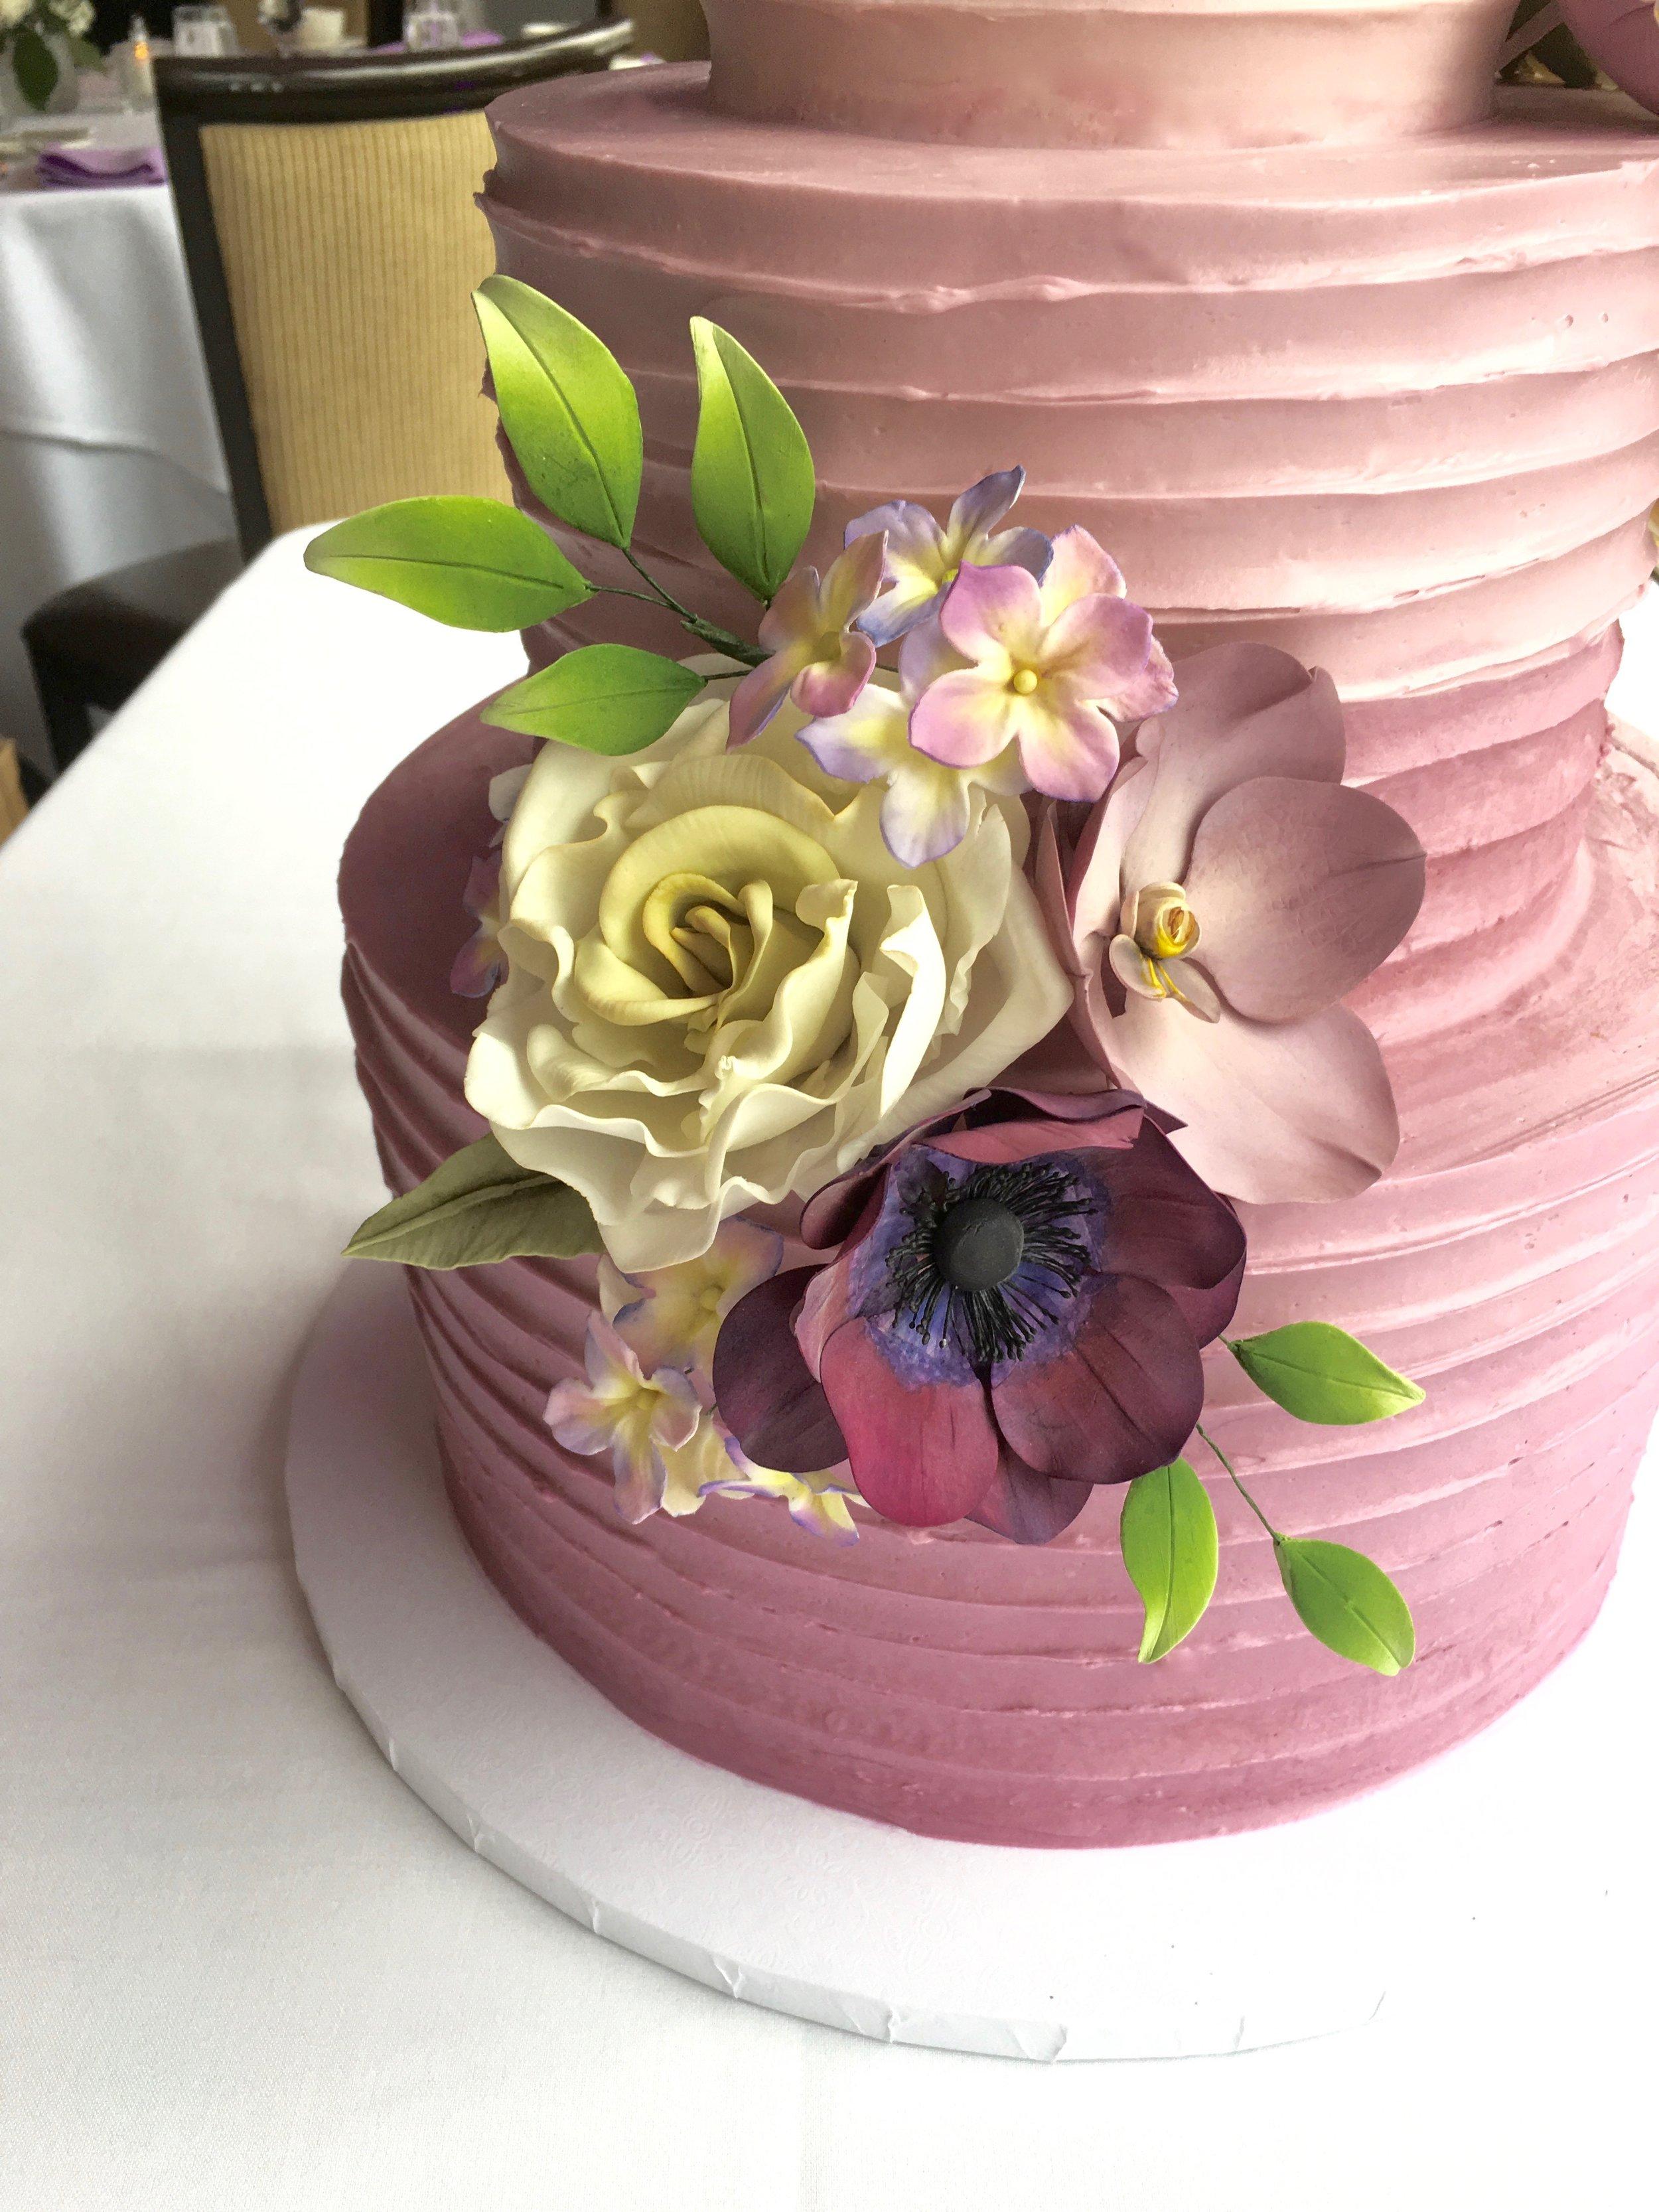 Sugar Vanda Orchid, Rose, Anemone, and Hydrangea. Image copyright Carla Schier.